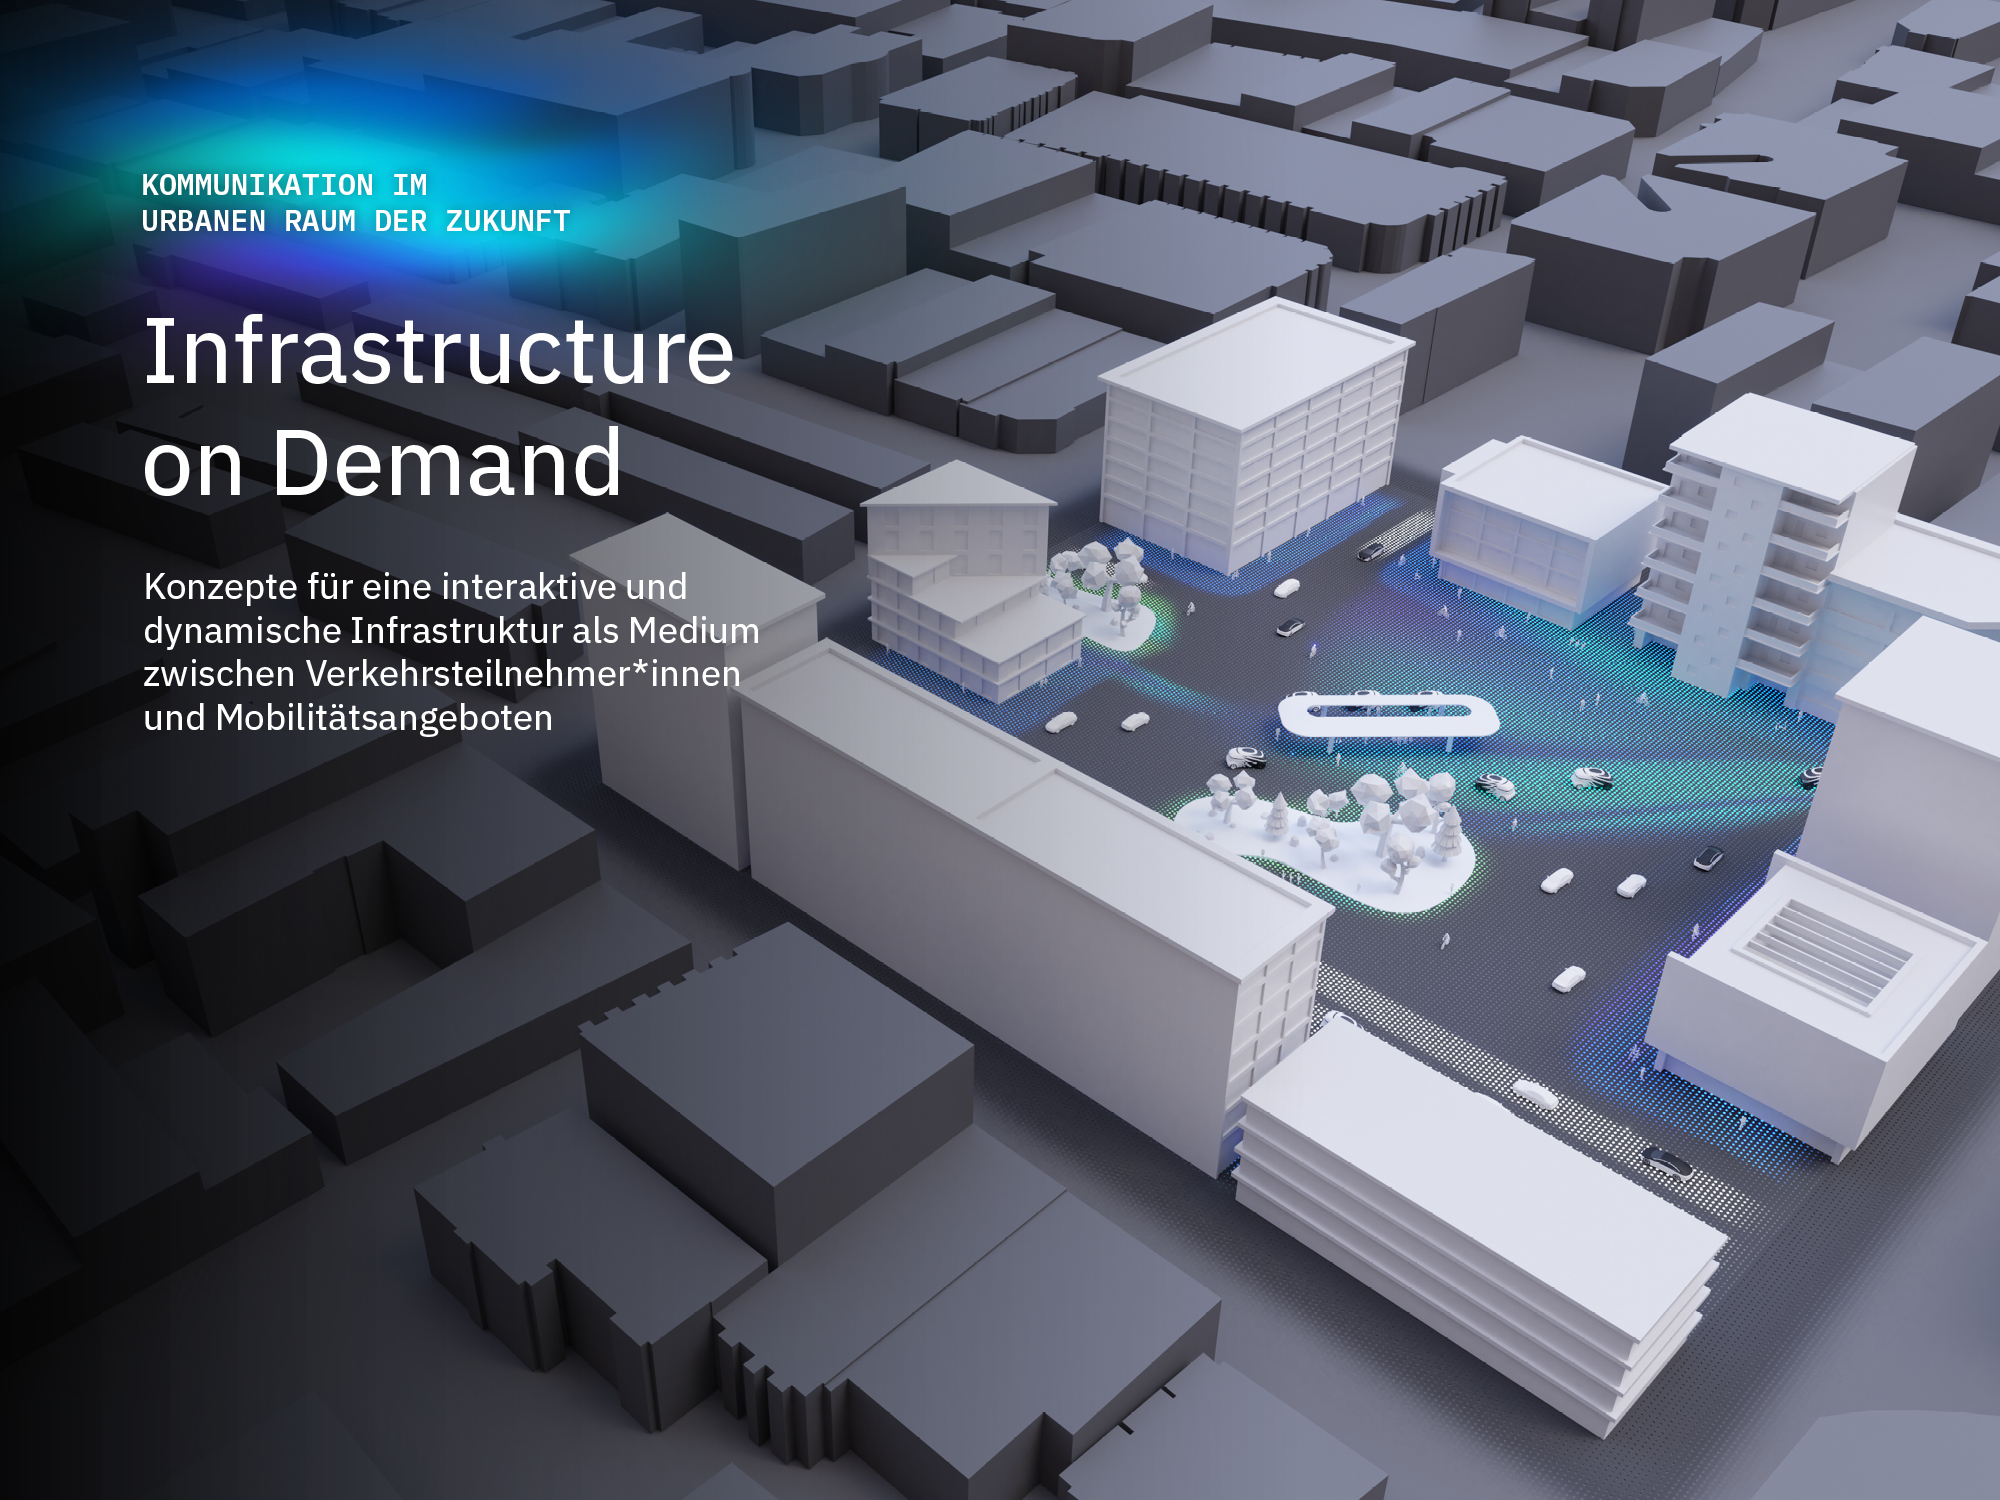 Infrastructure on Demand